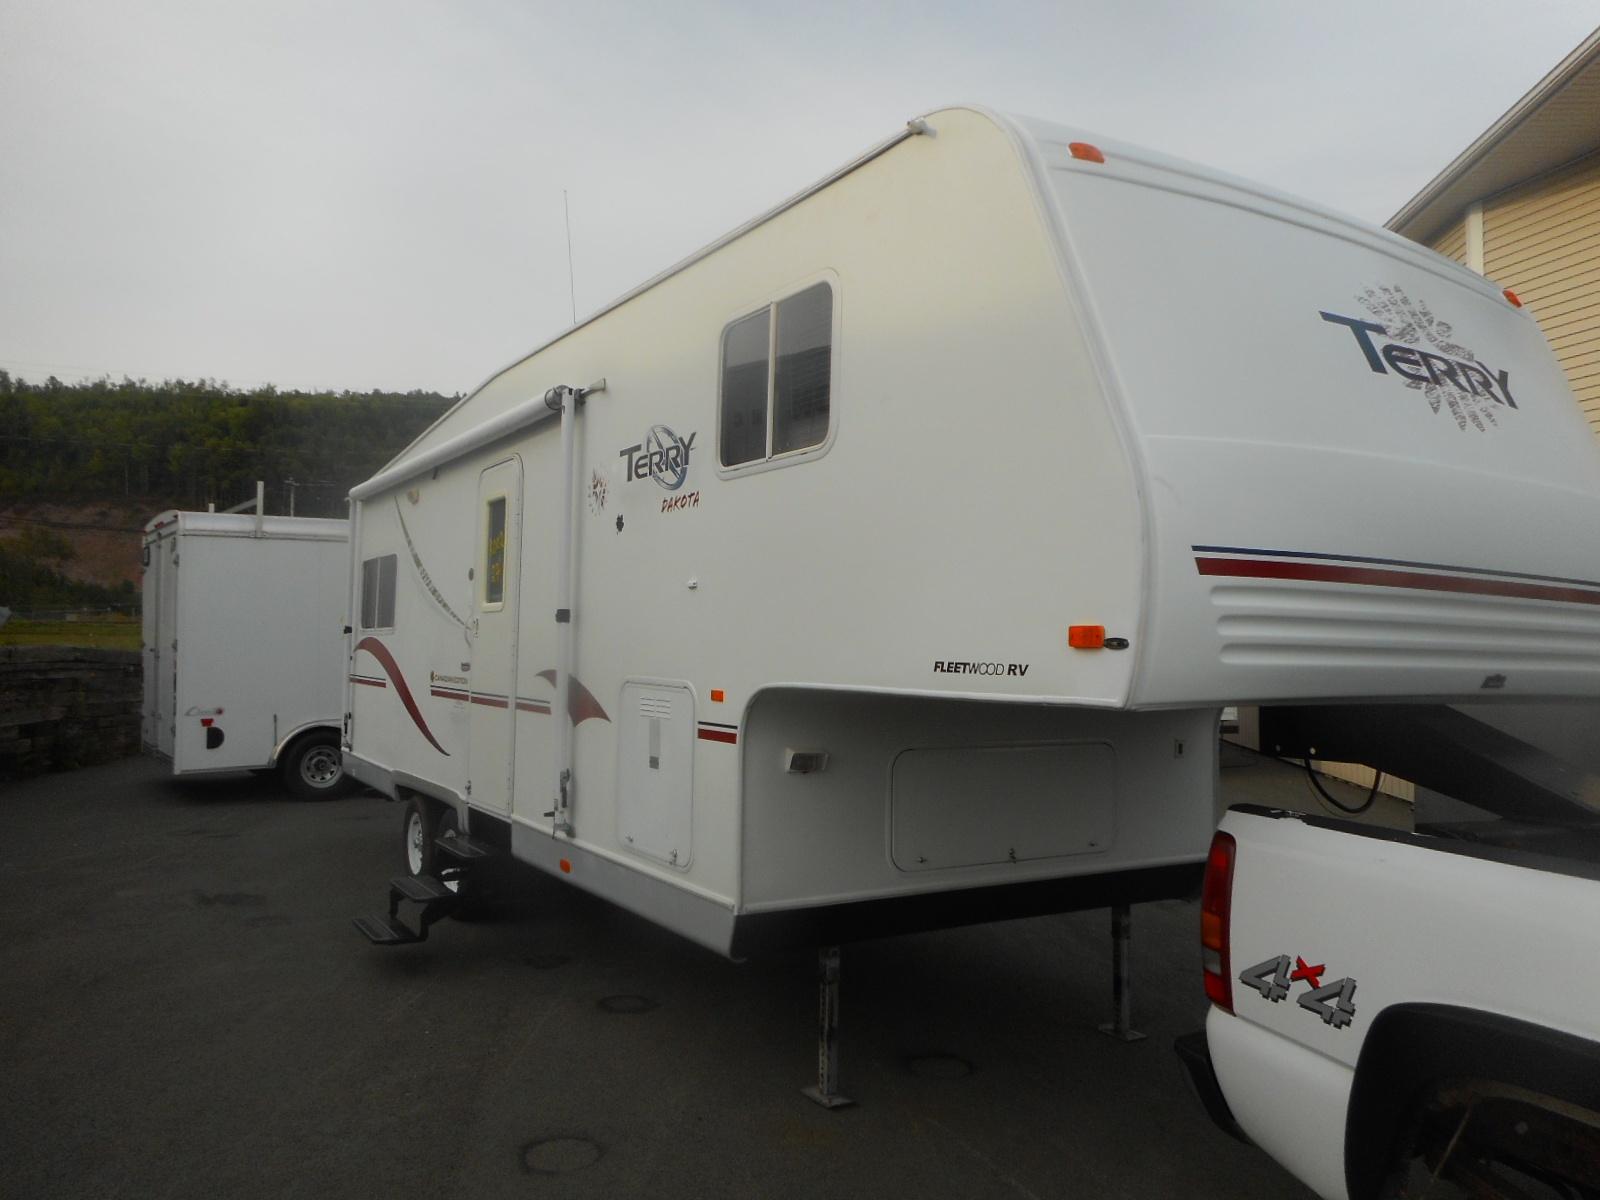 2002 terry dakota 827-59 5th wheel